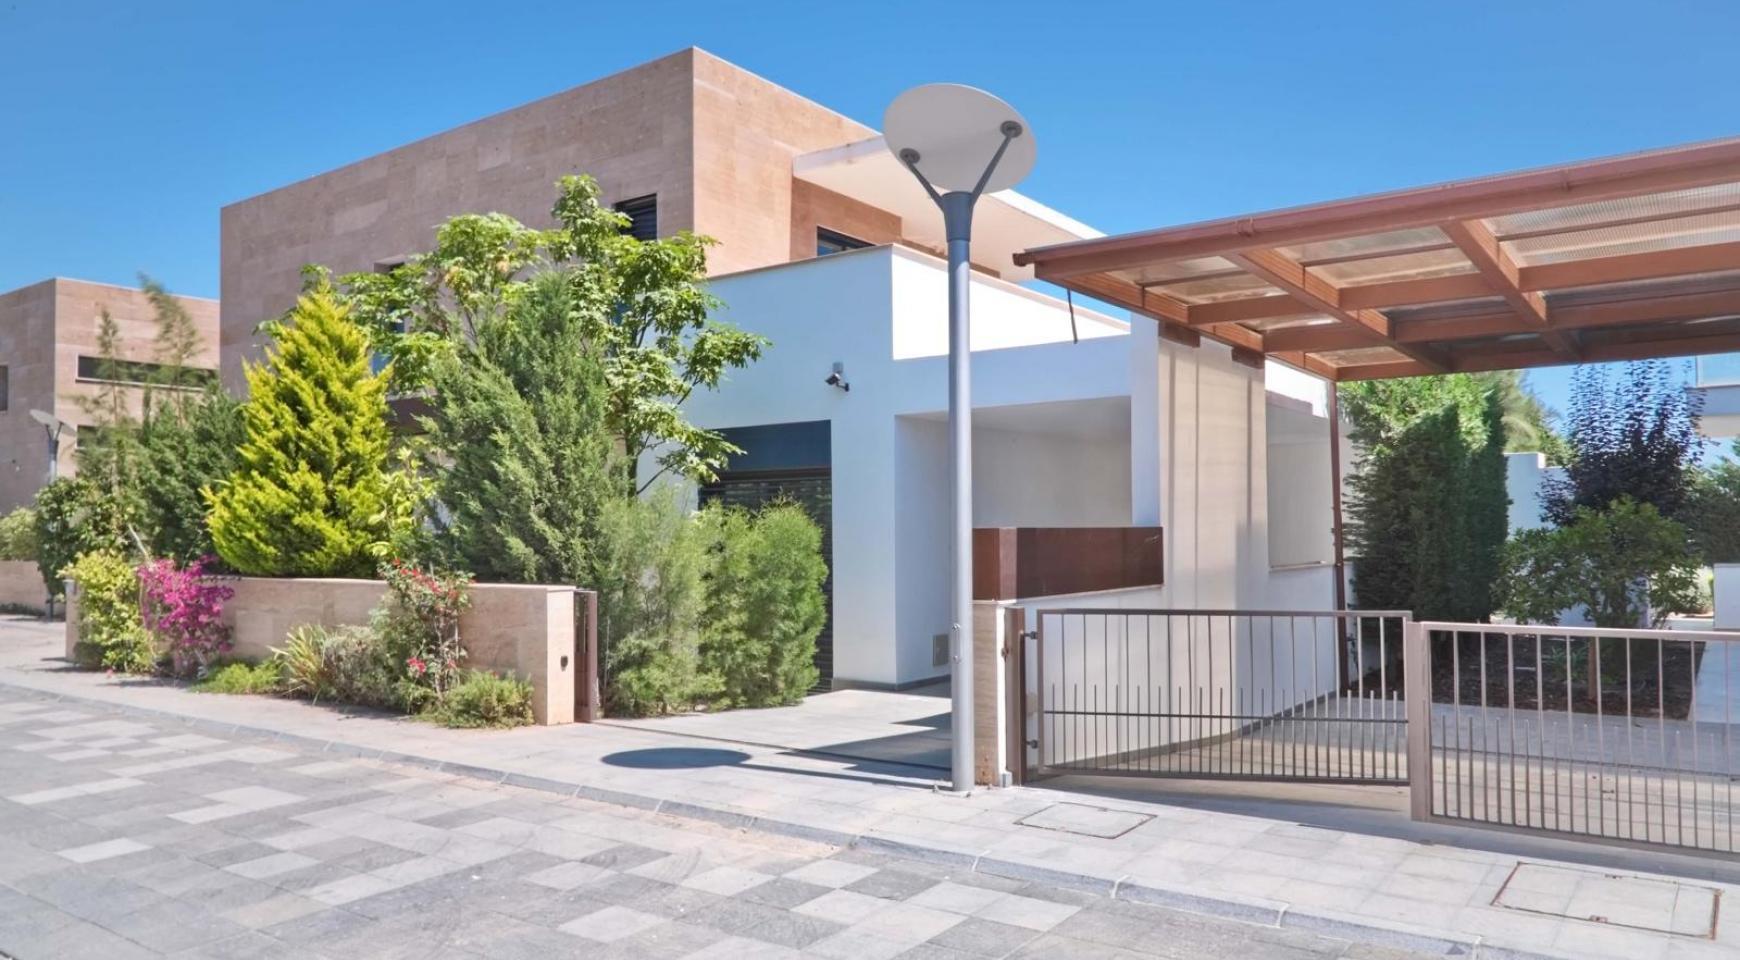 New Luxurious 4 Bedroom Villa in the Tourist Area - 10